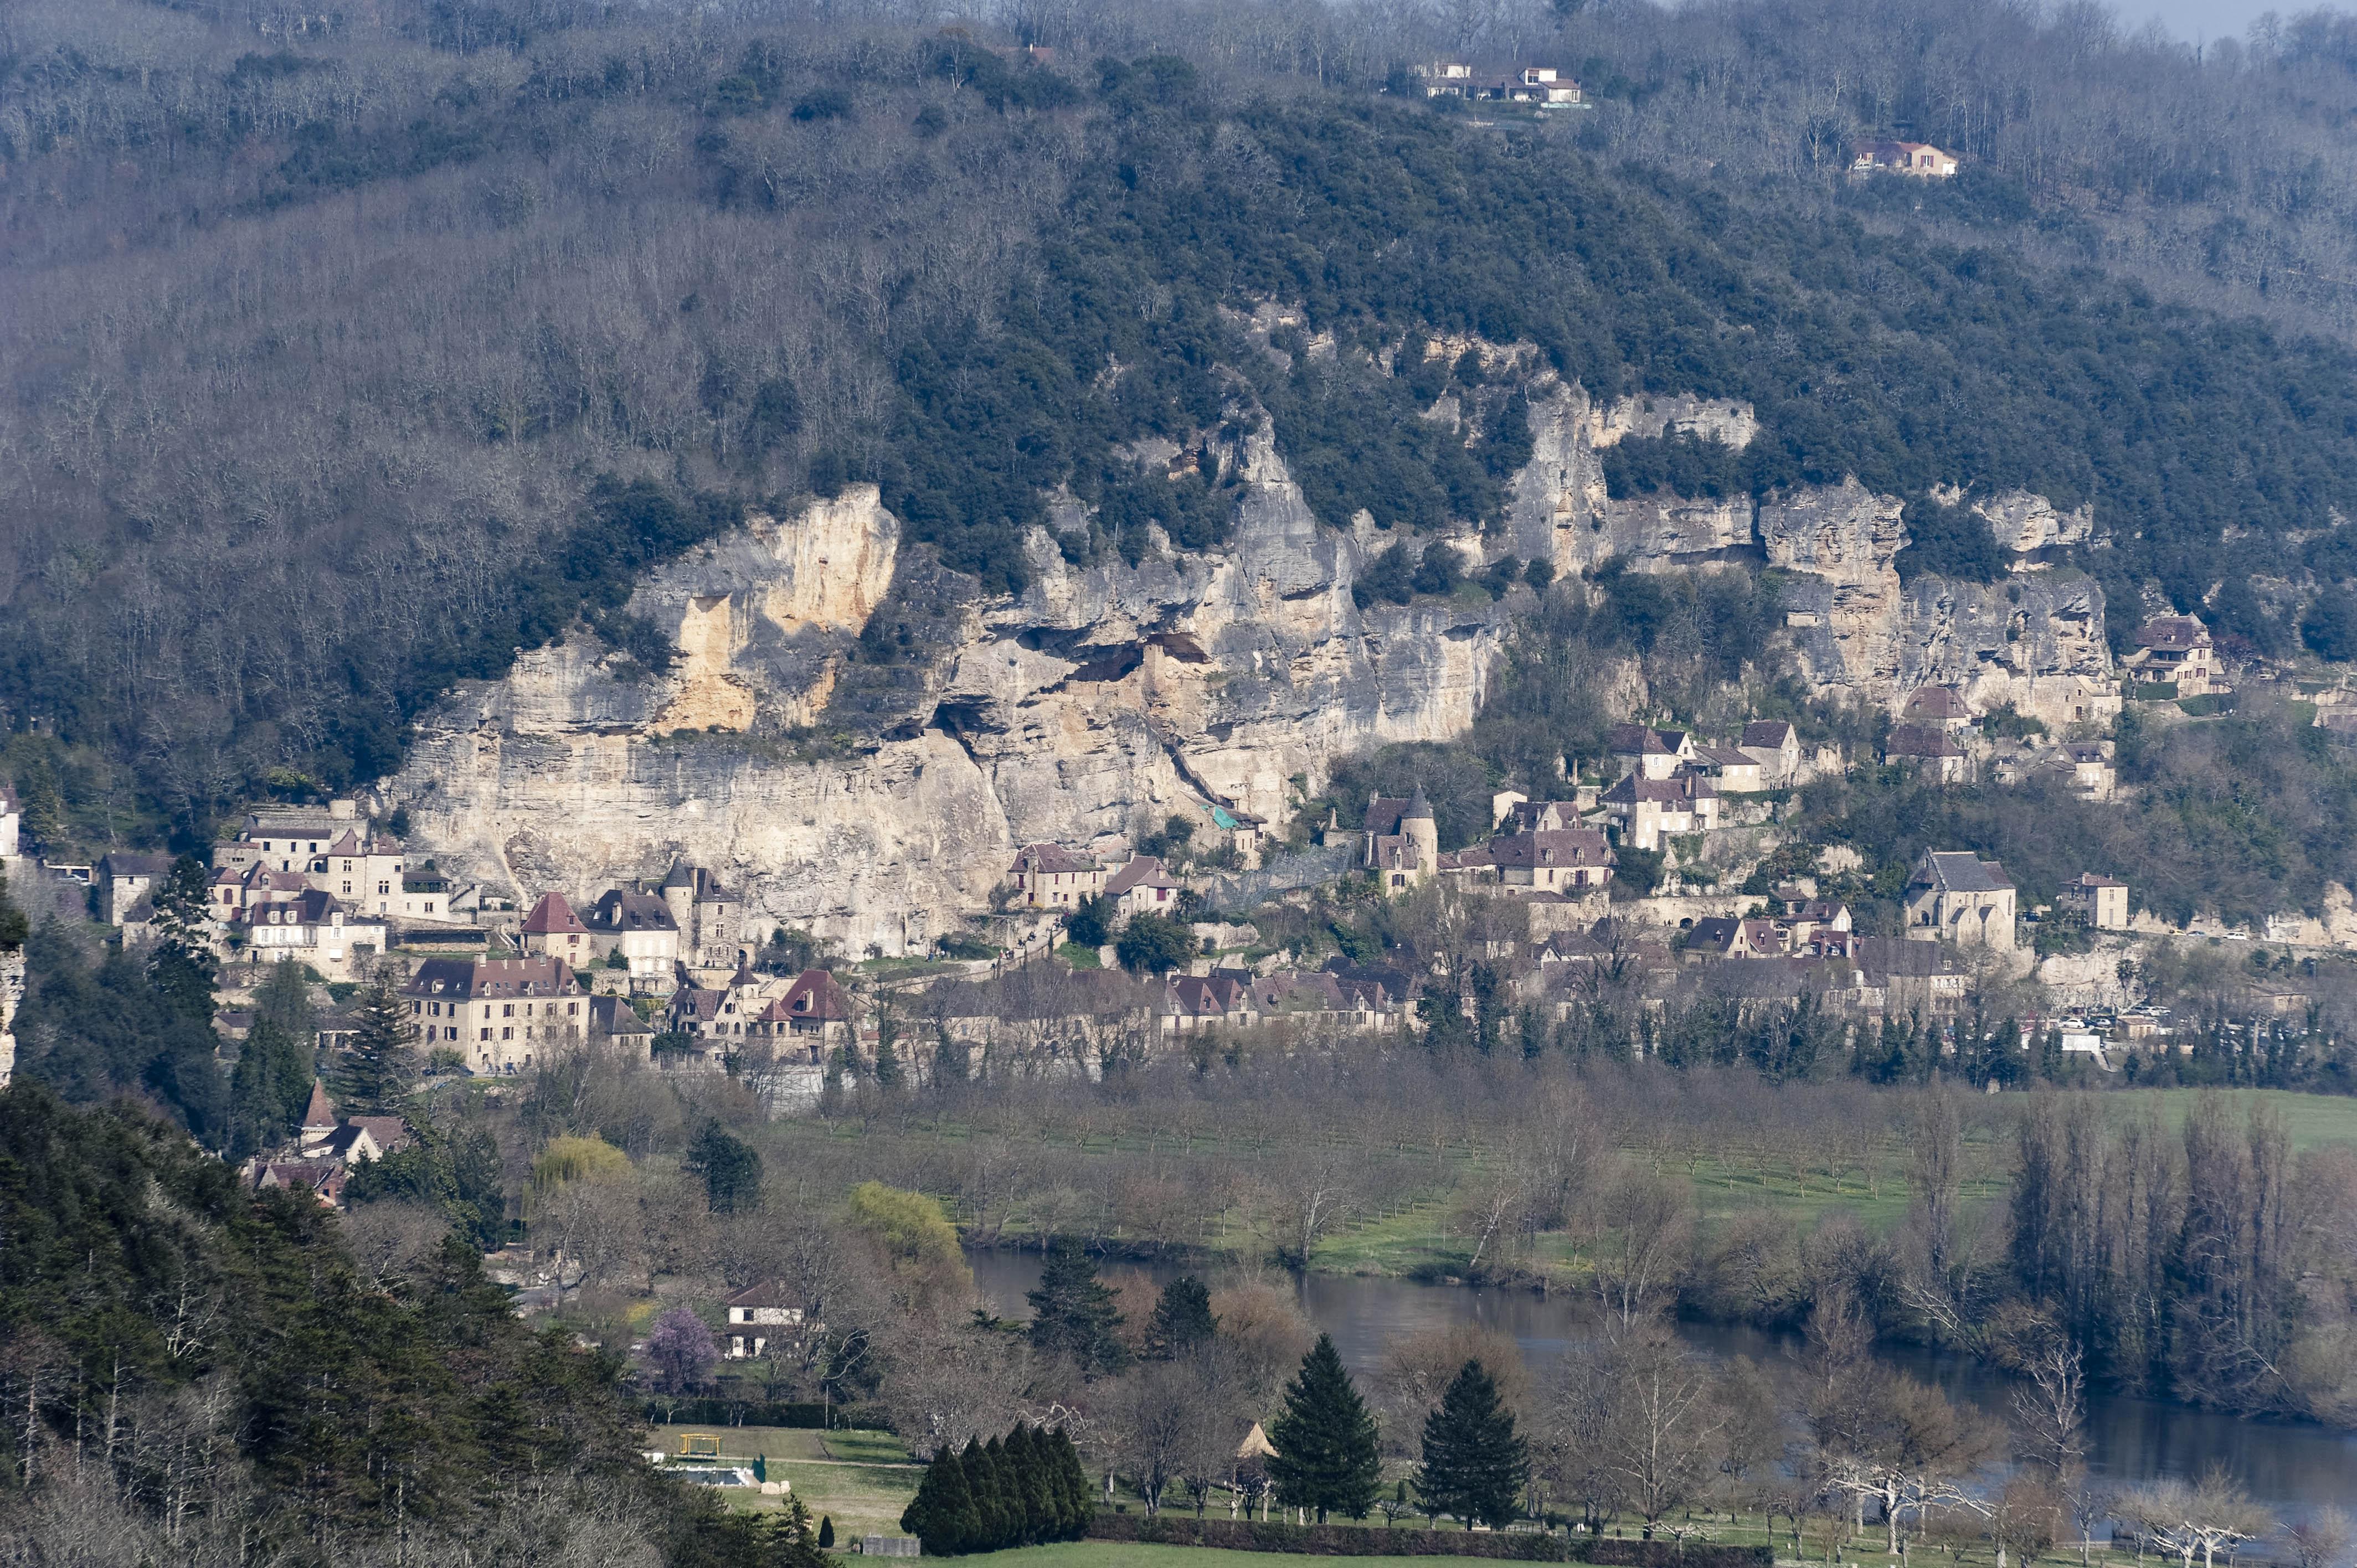 MAI_1695_La Roque Gageac